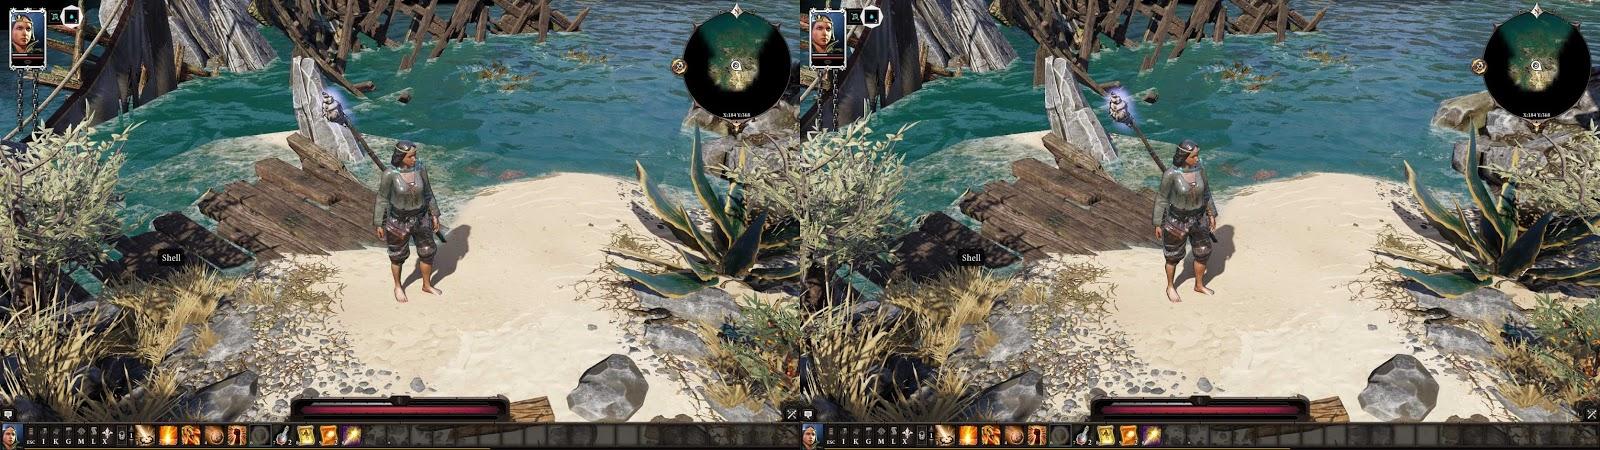 Helix Mod: Divinity Original Sin 2